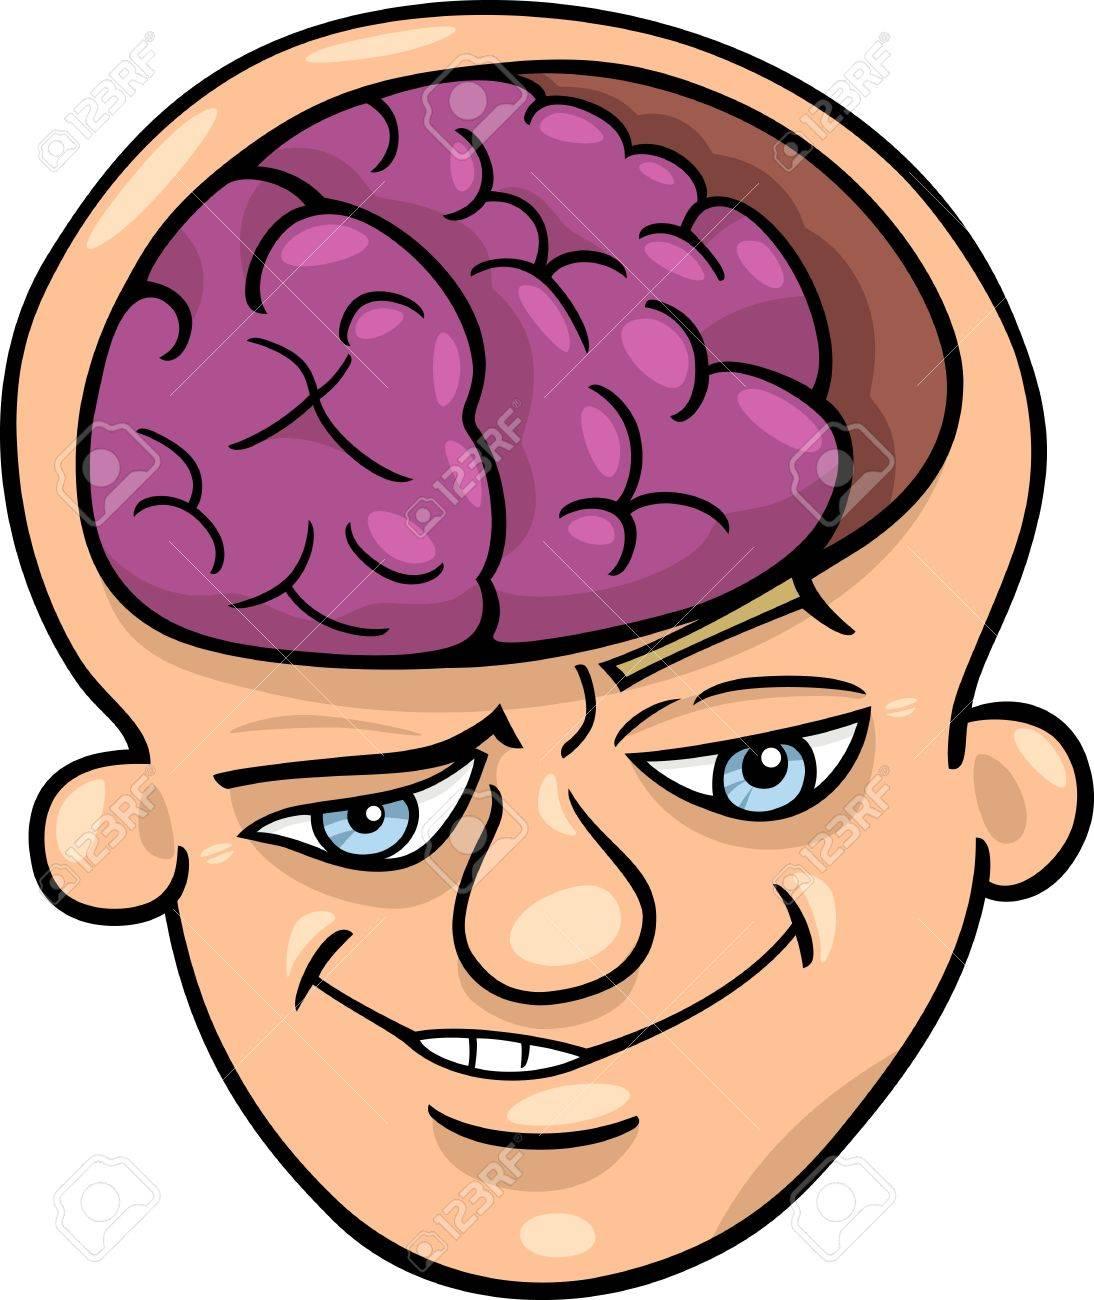 Humorous Cartoon Illustration of Brainy Man or Smart Guy Stock Vector - 14601370